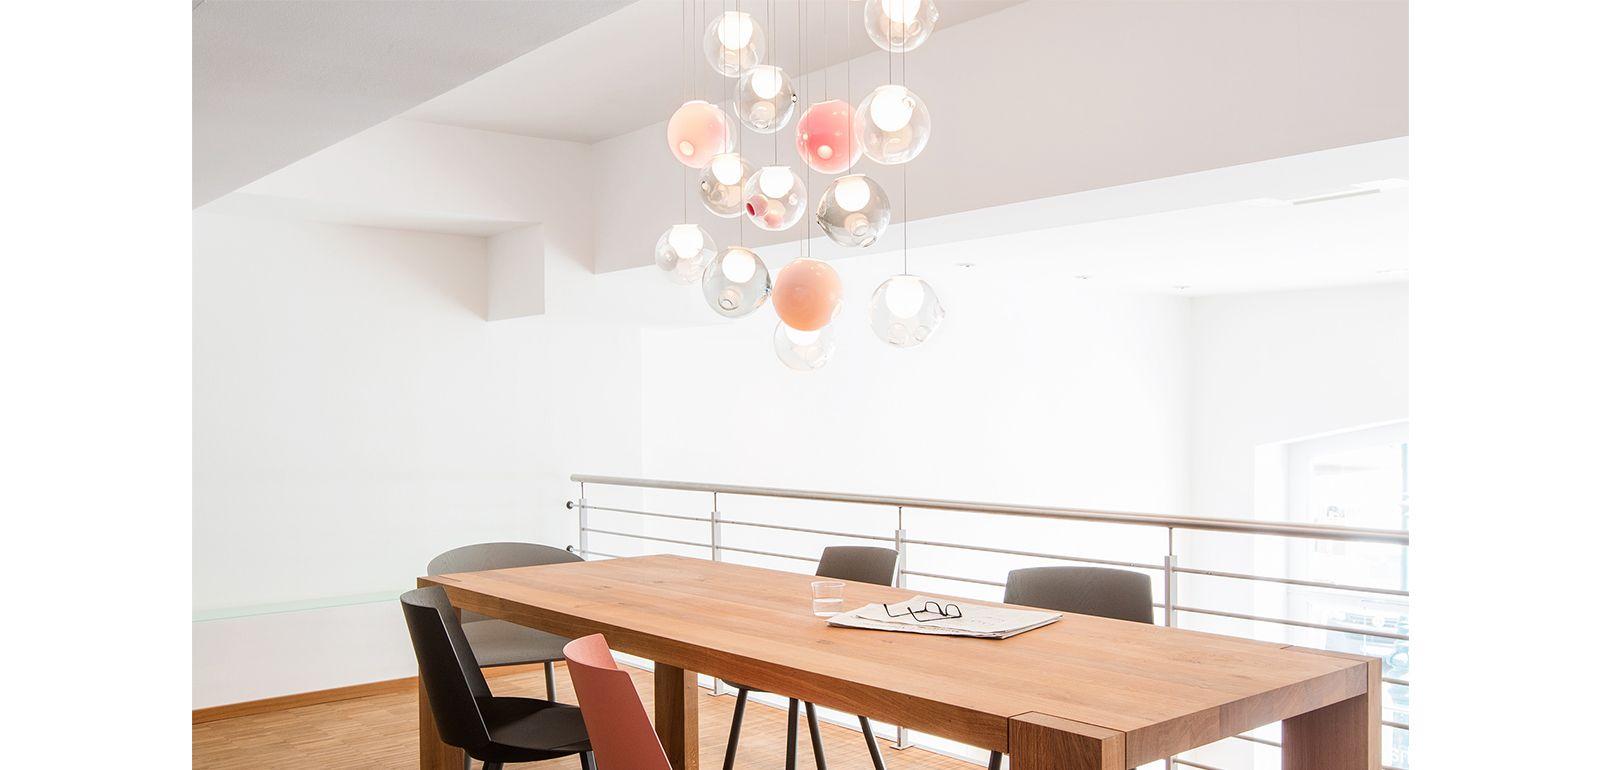 Luminaires silvera - Luminaires design habitat ...